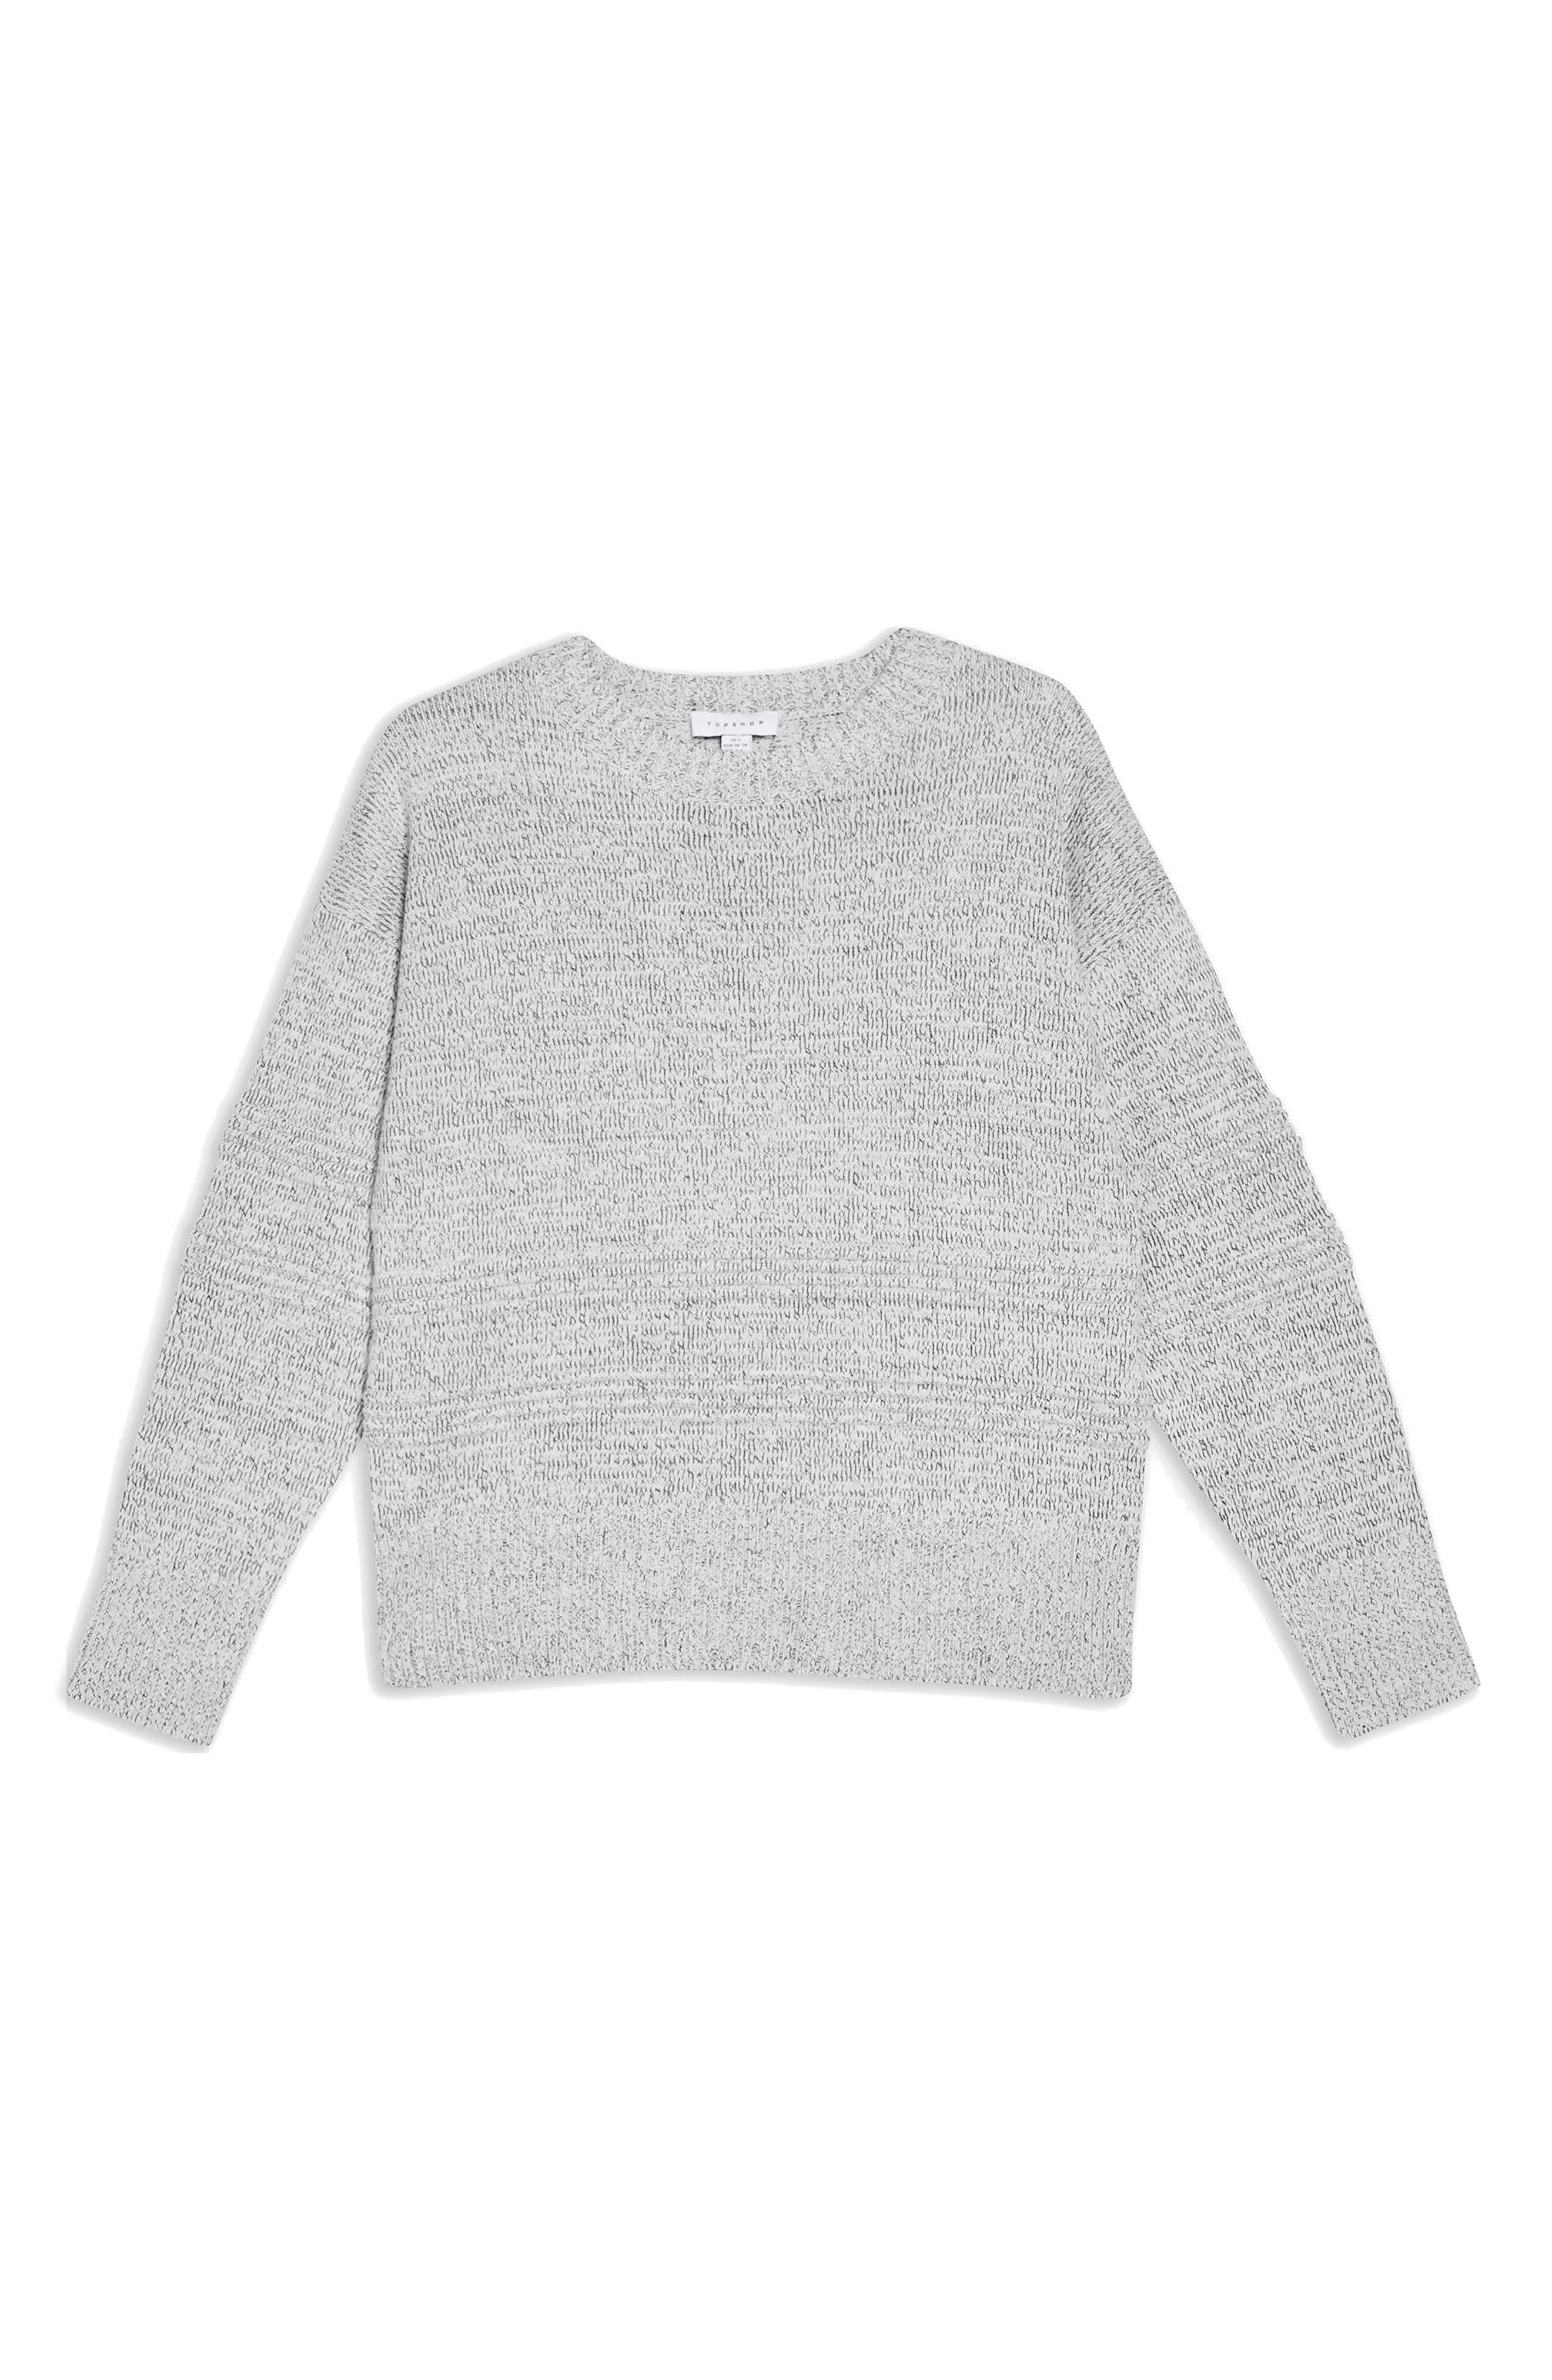 TOPSHOP,                             Ottoman Stitch Sweater,                             Alternate thumbnail 3, color,                             GREY MARL